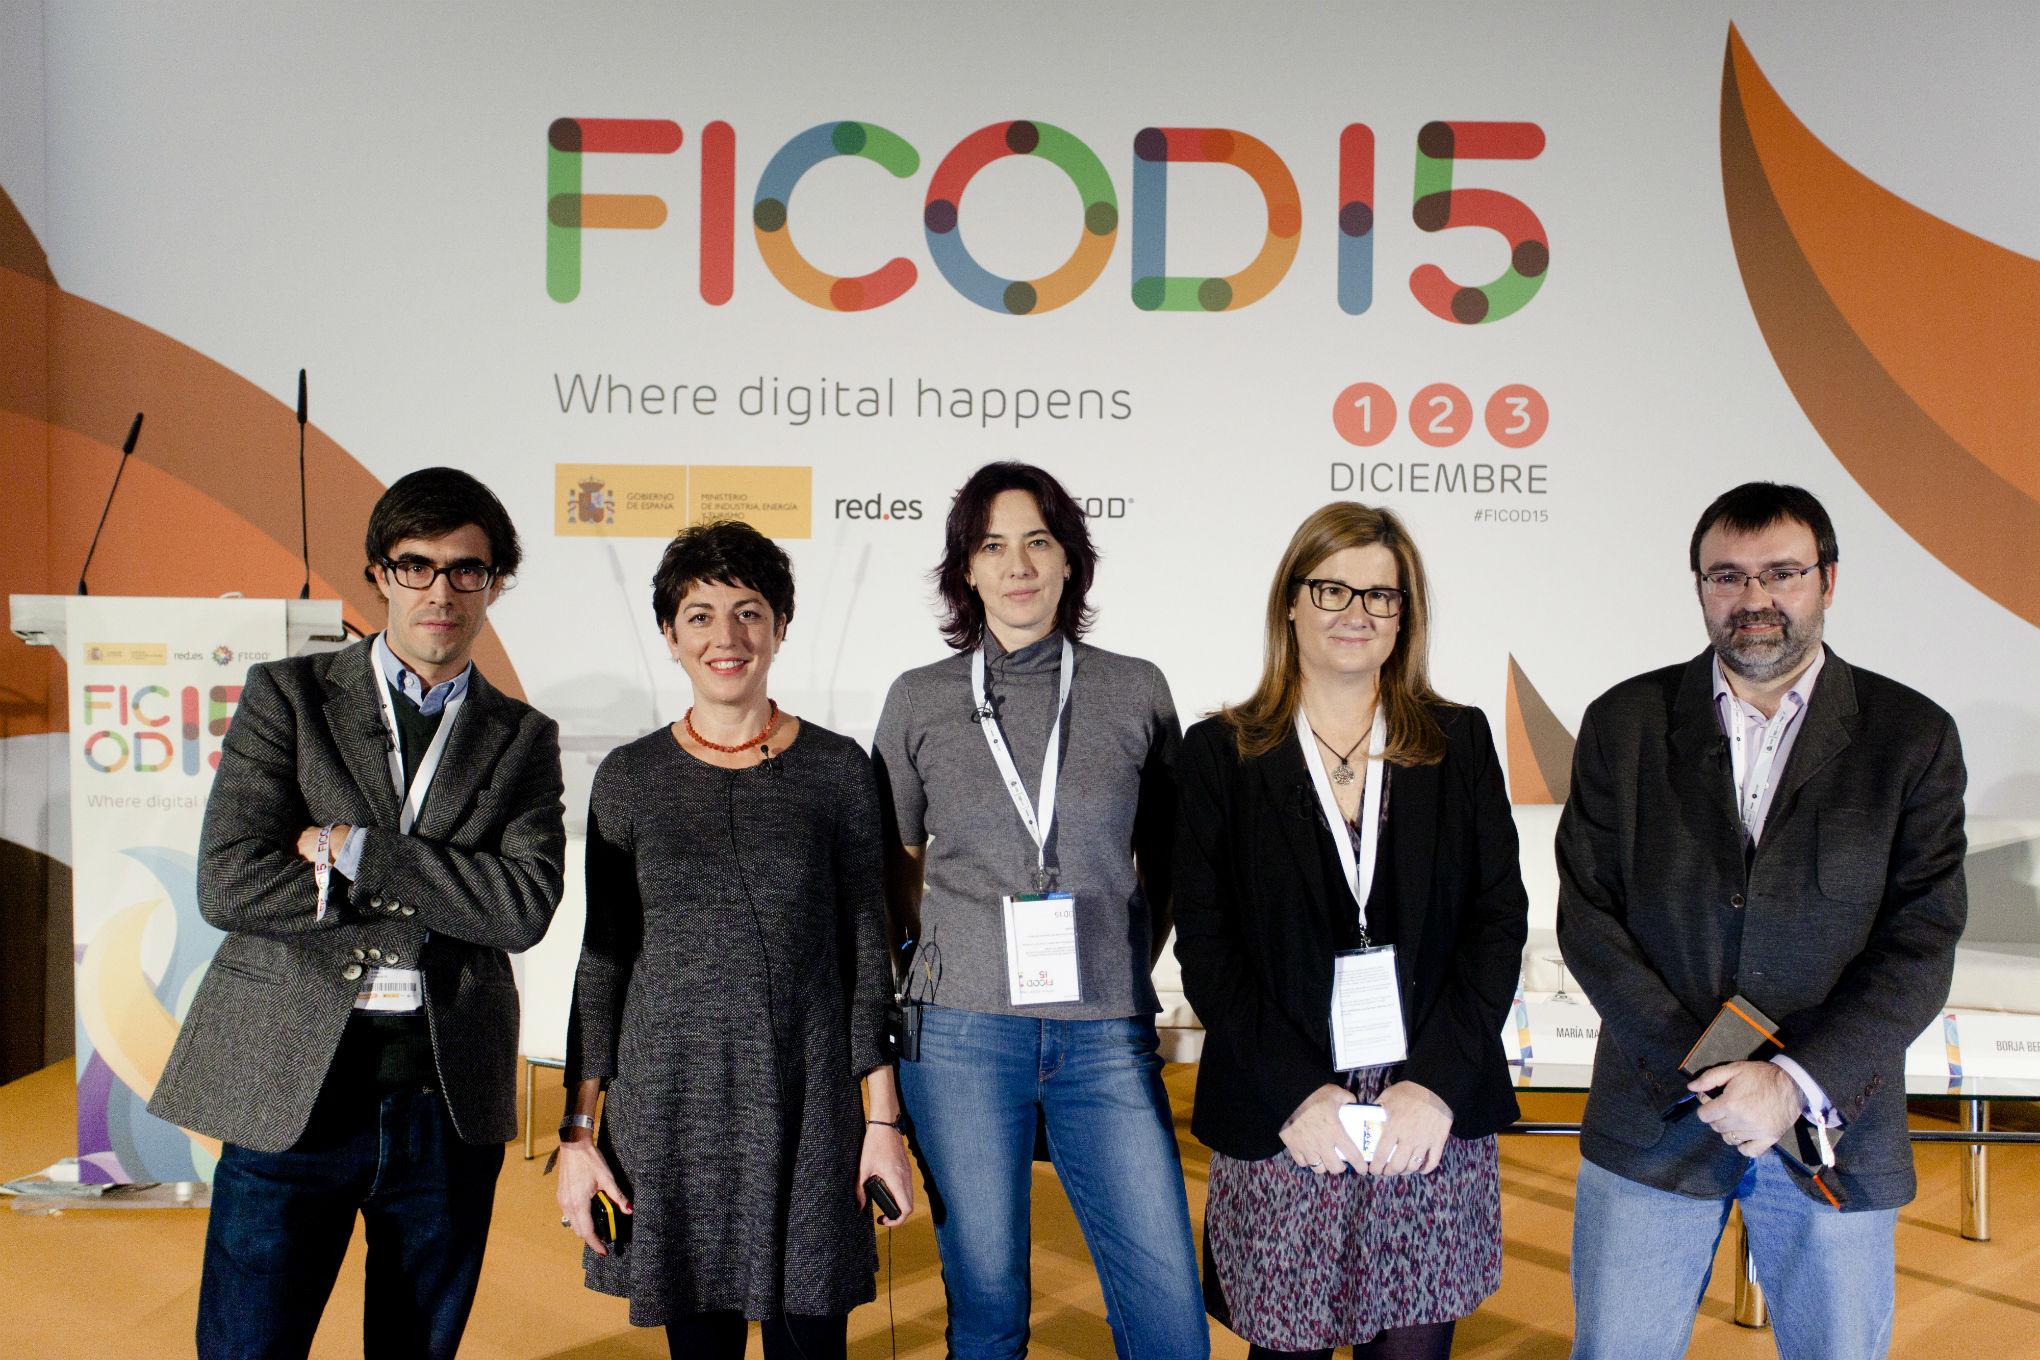 La prensa digital a debate en Ficod 2015